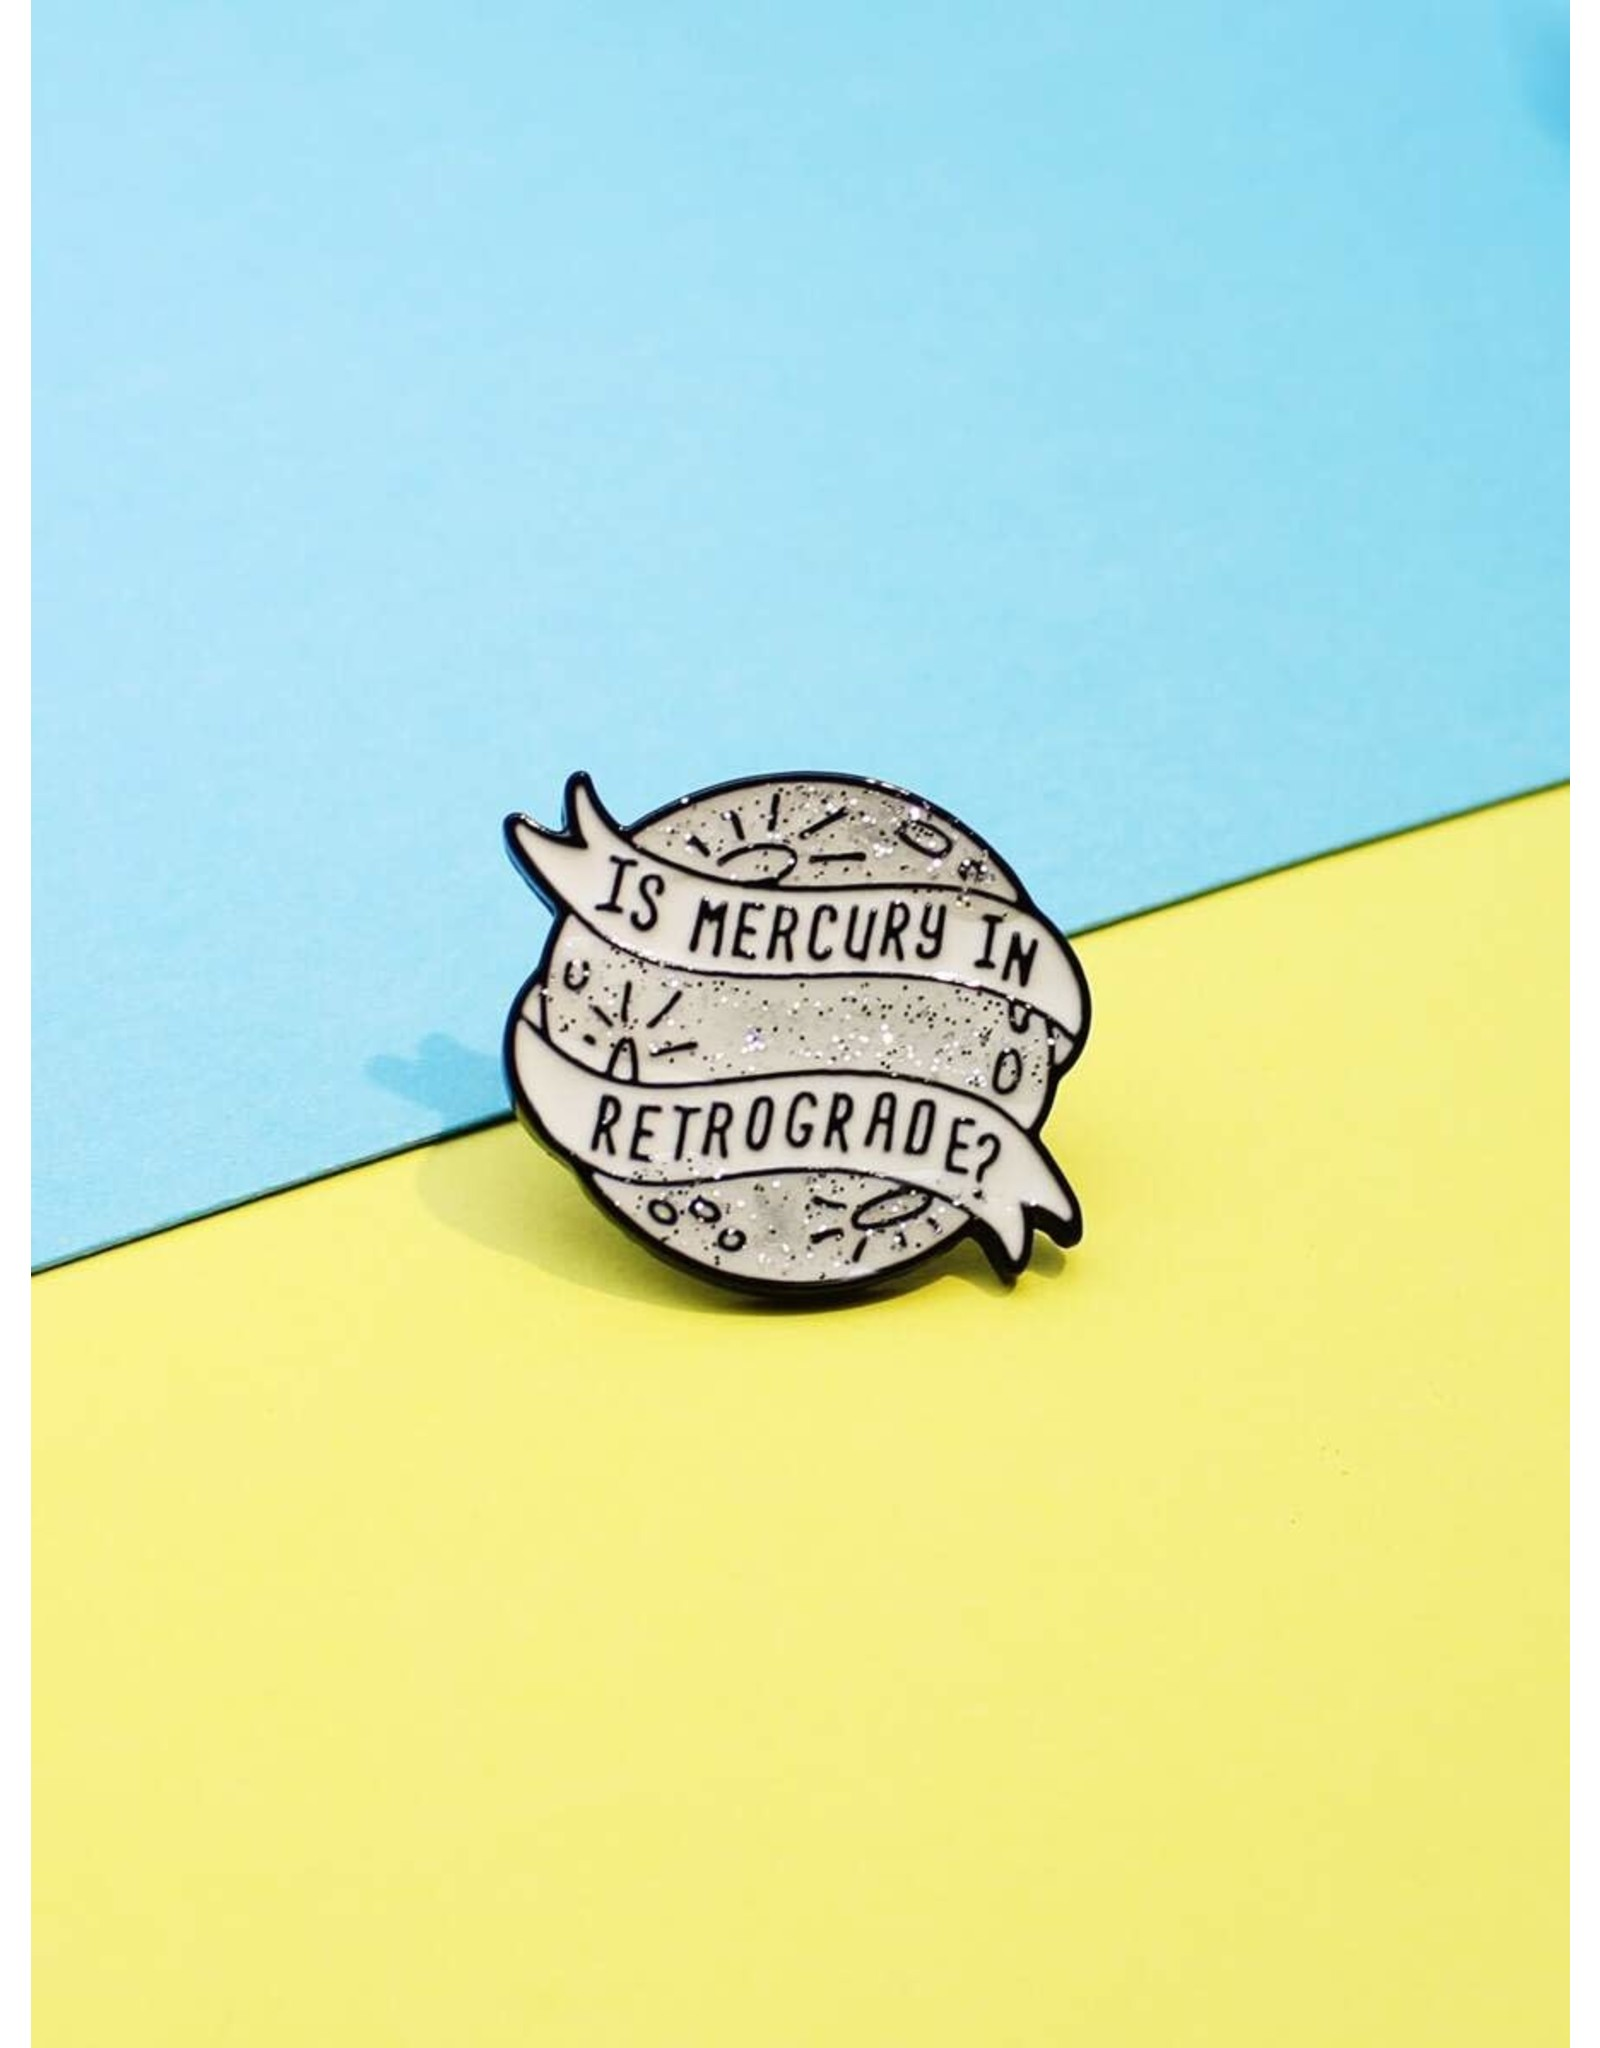 Shein Pin - Is Mercury In Retrograde